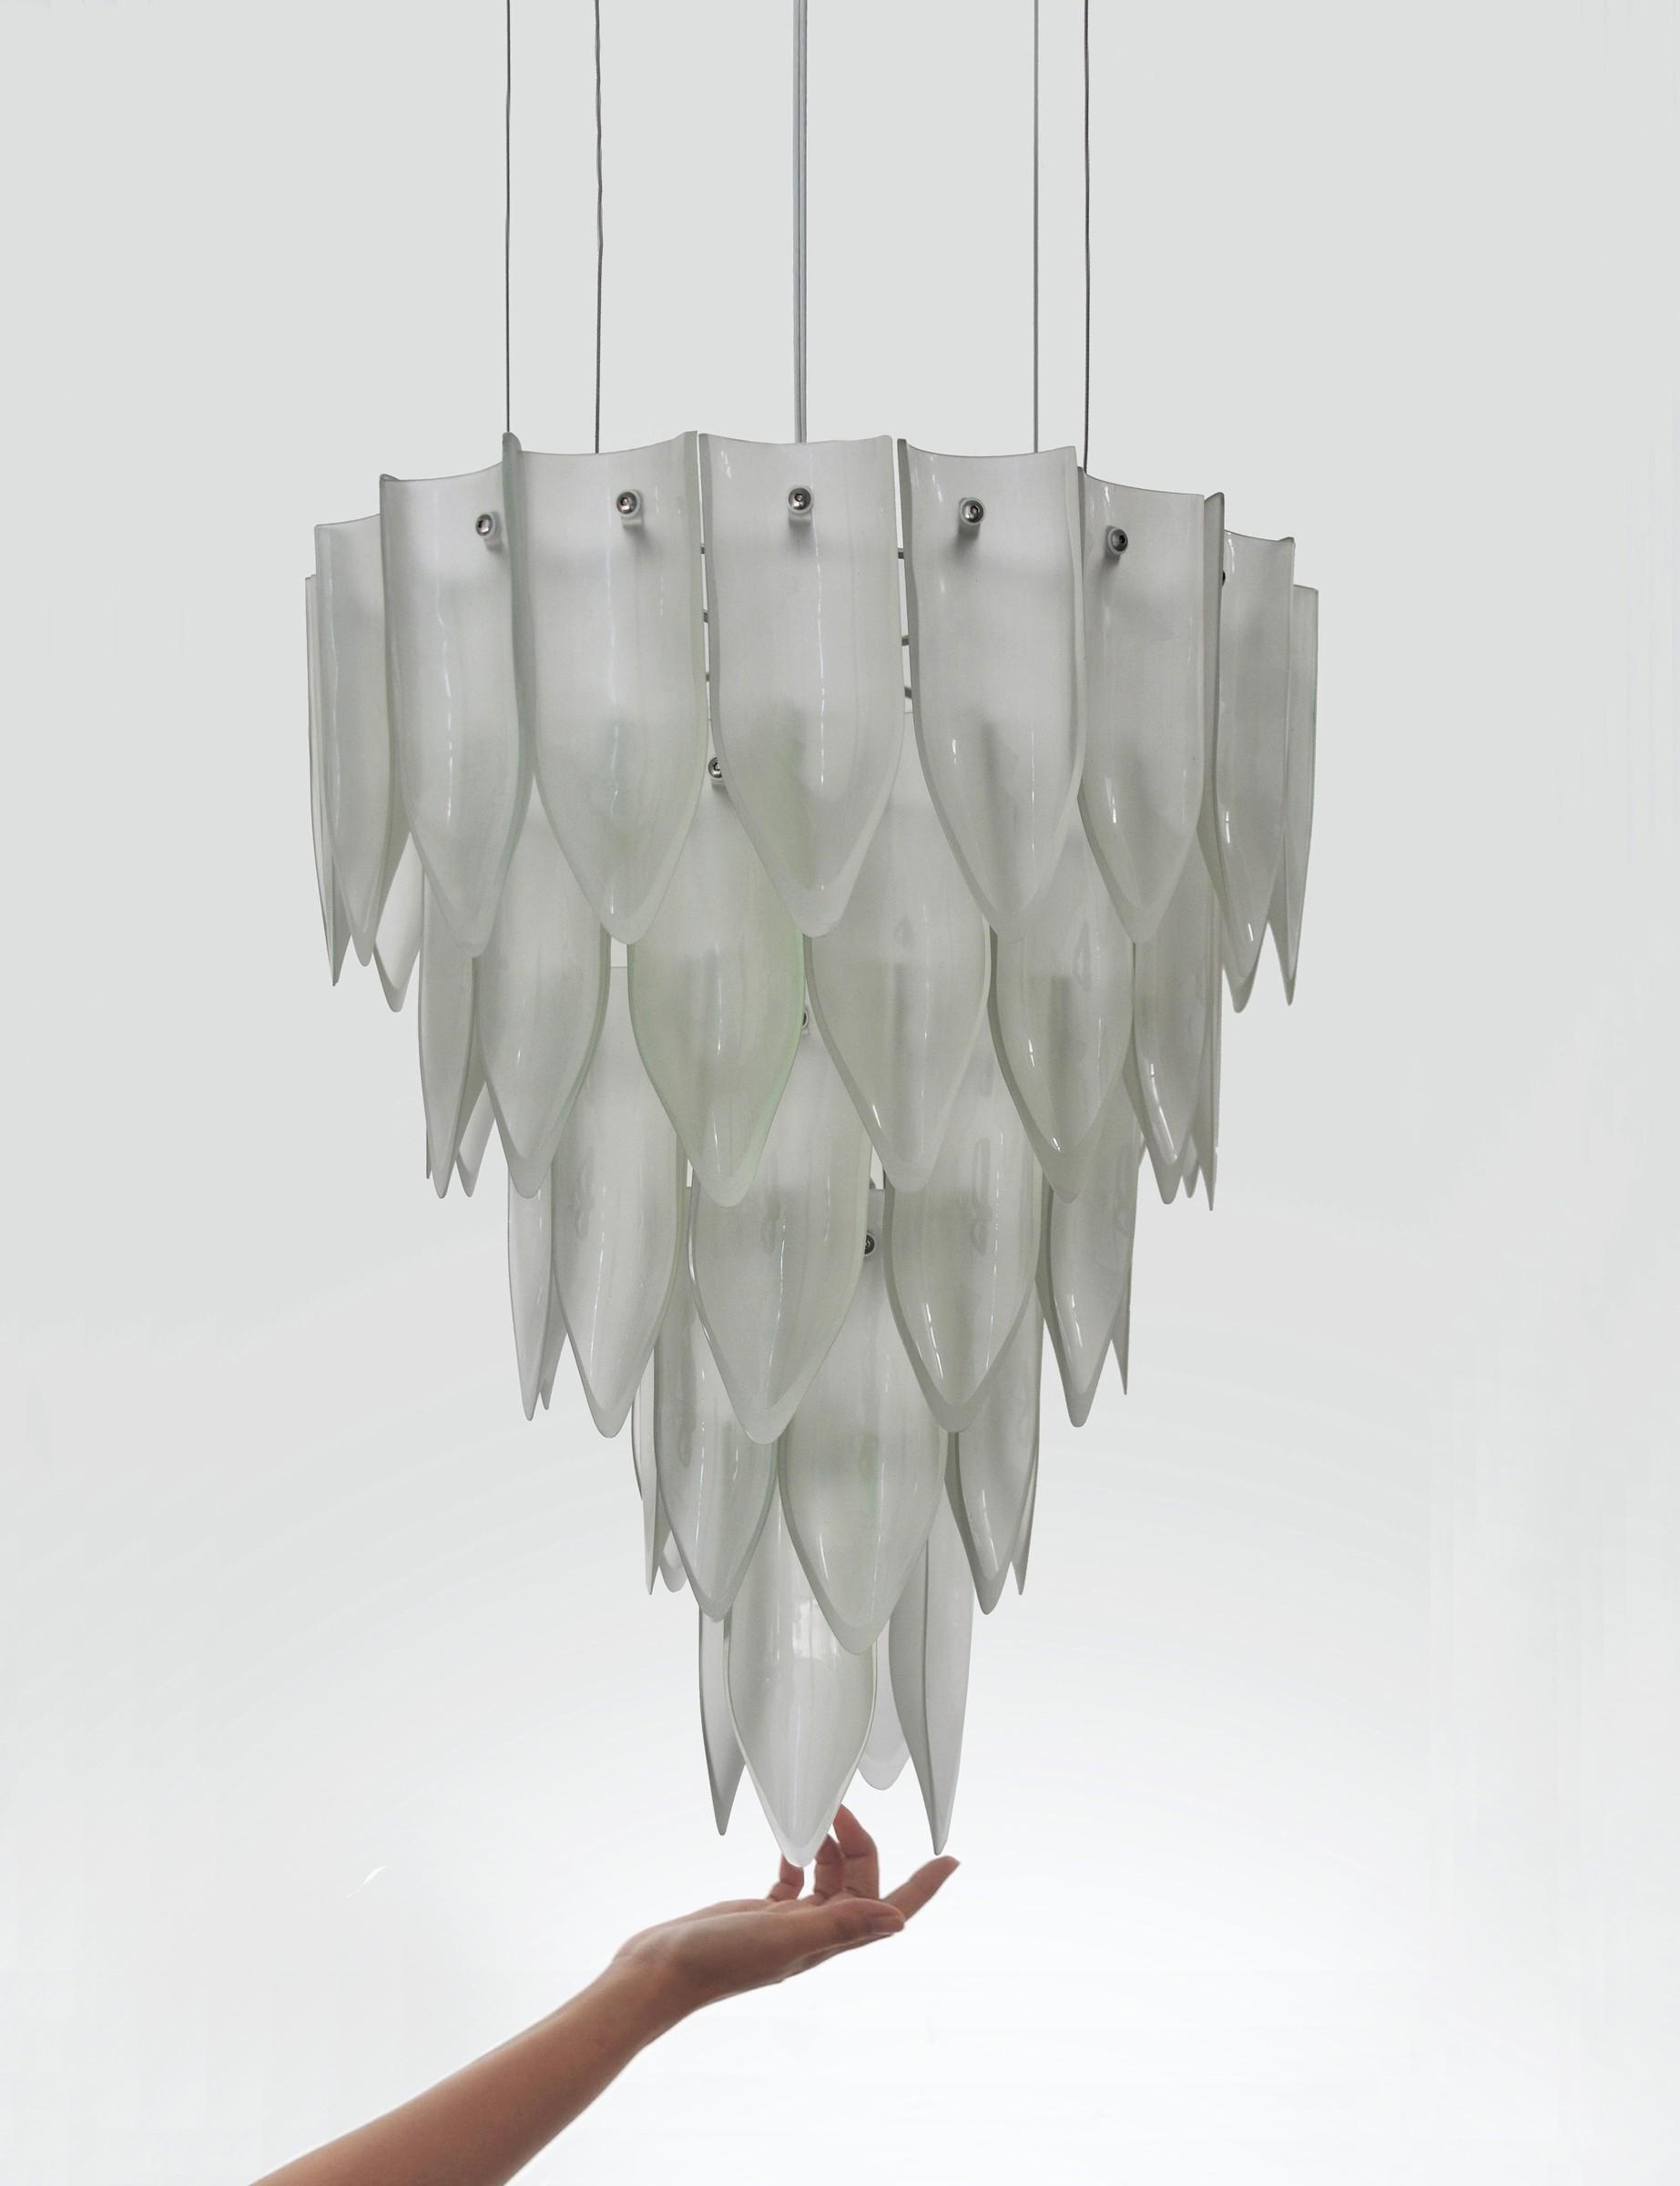 Transglass Chandelier · Tord Boontje